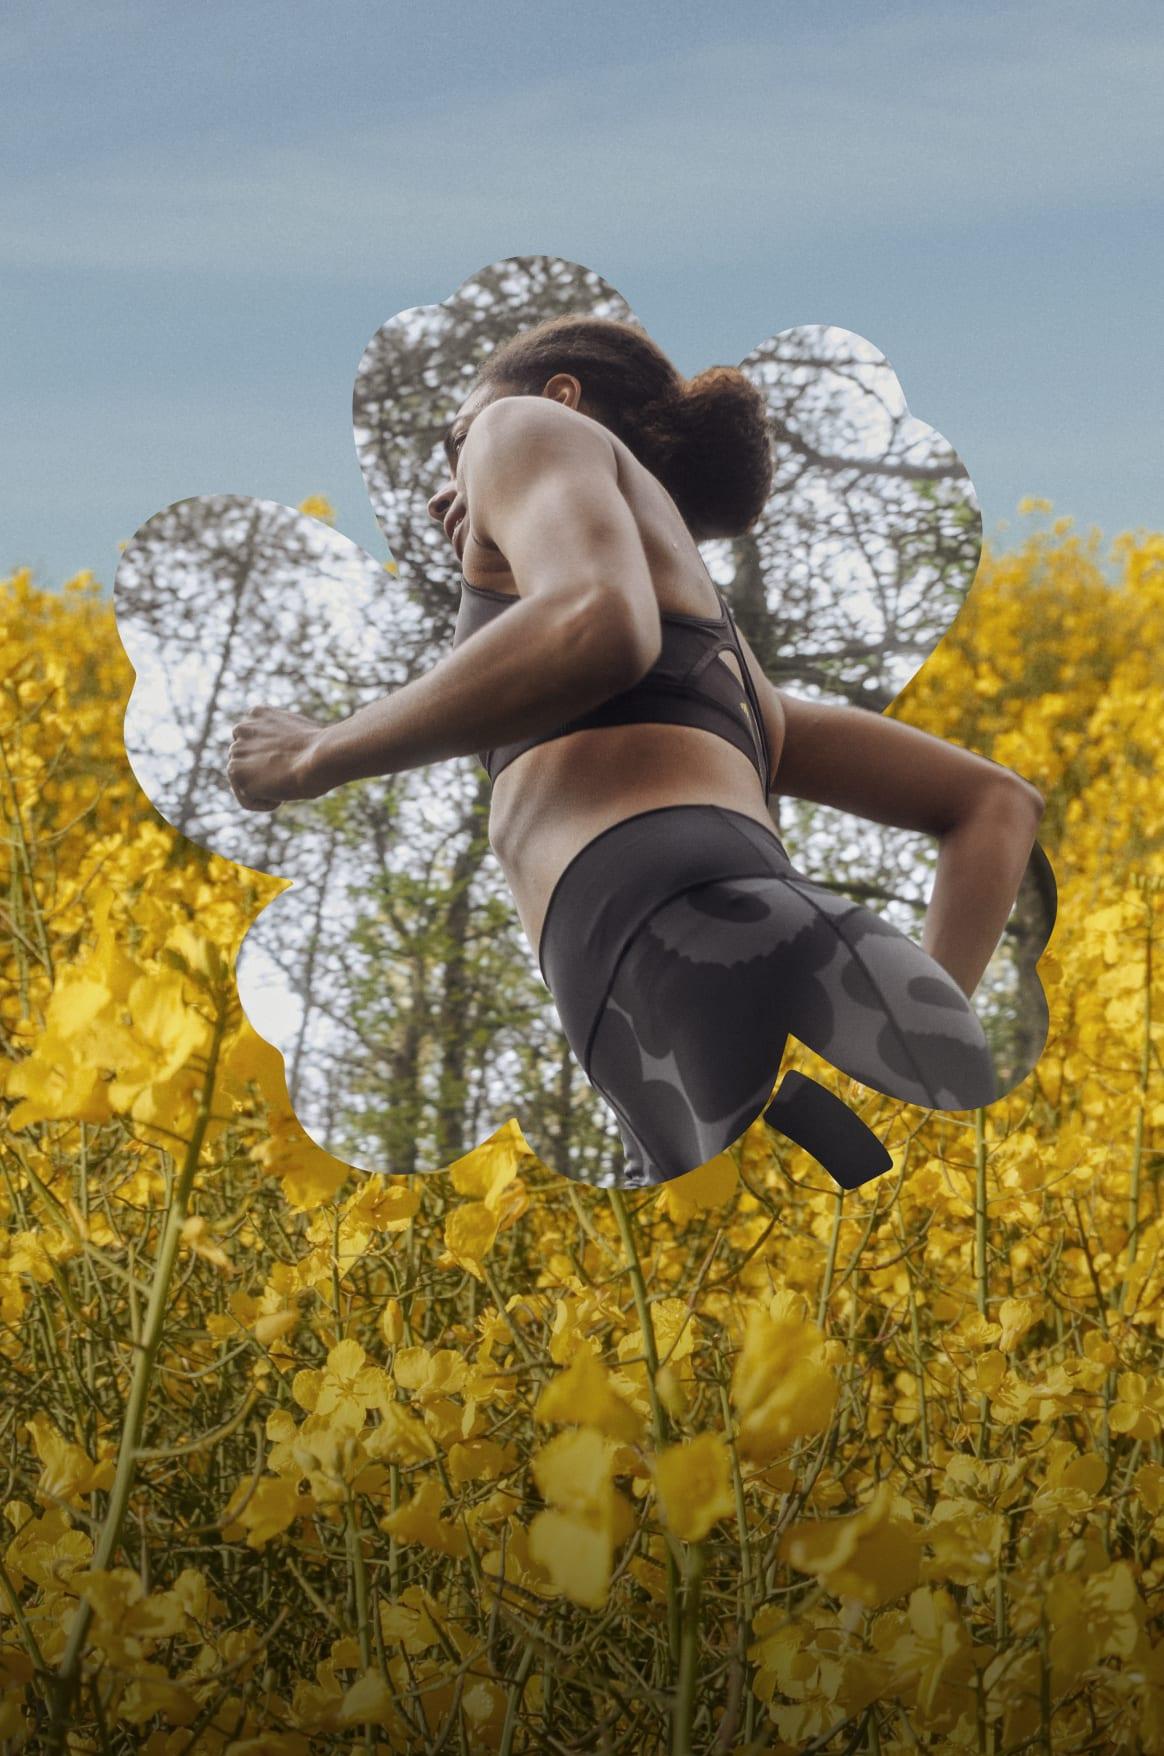 Female running in Marimekko